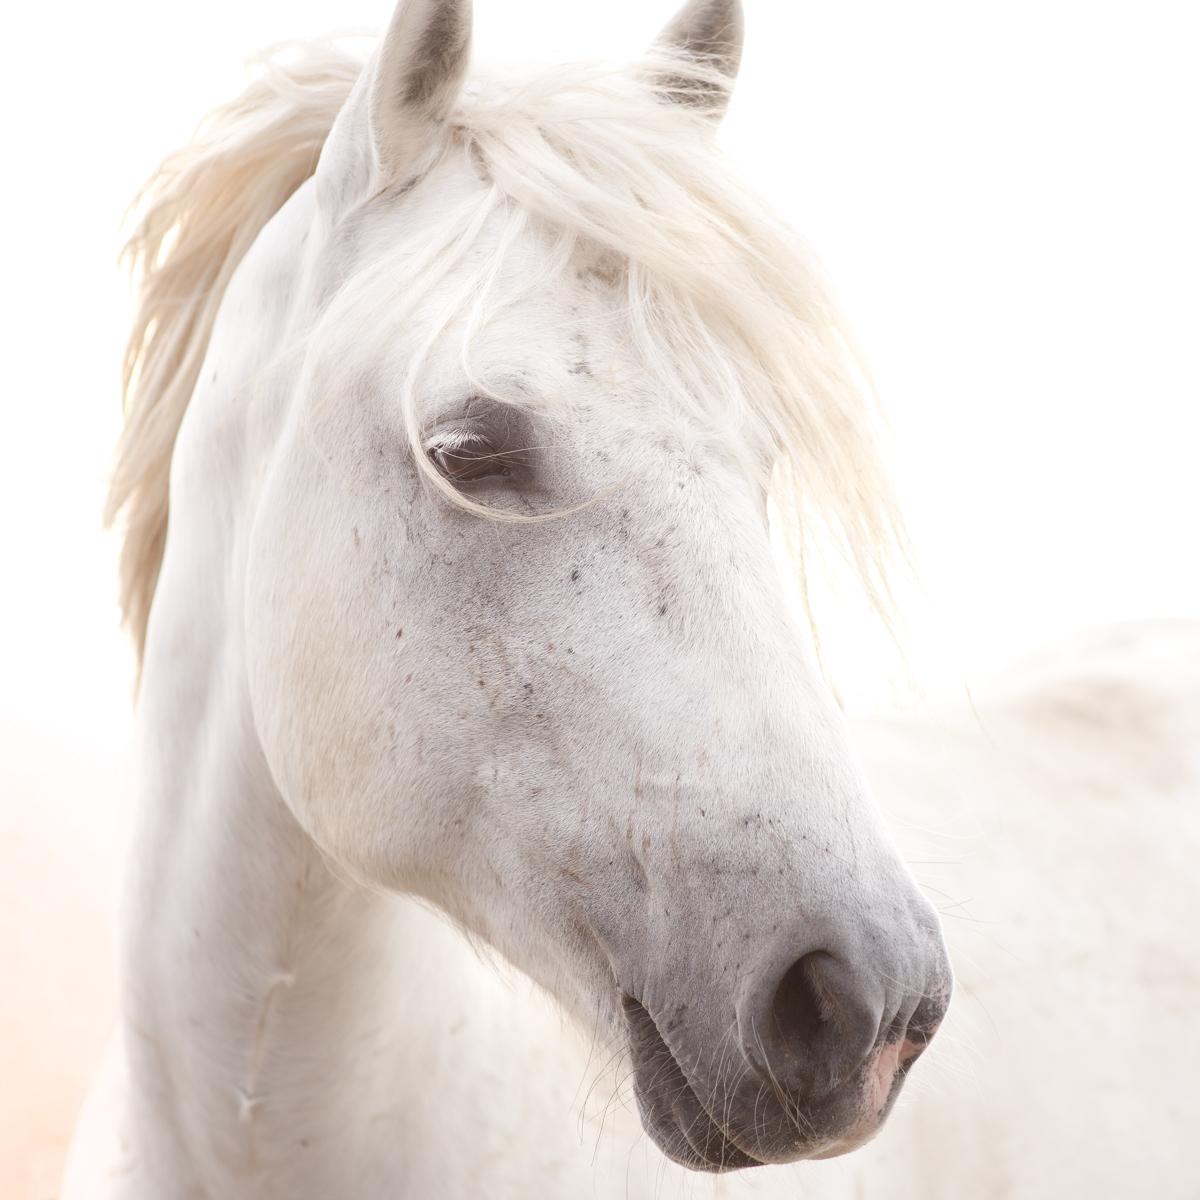 Equine 2031